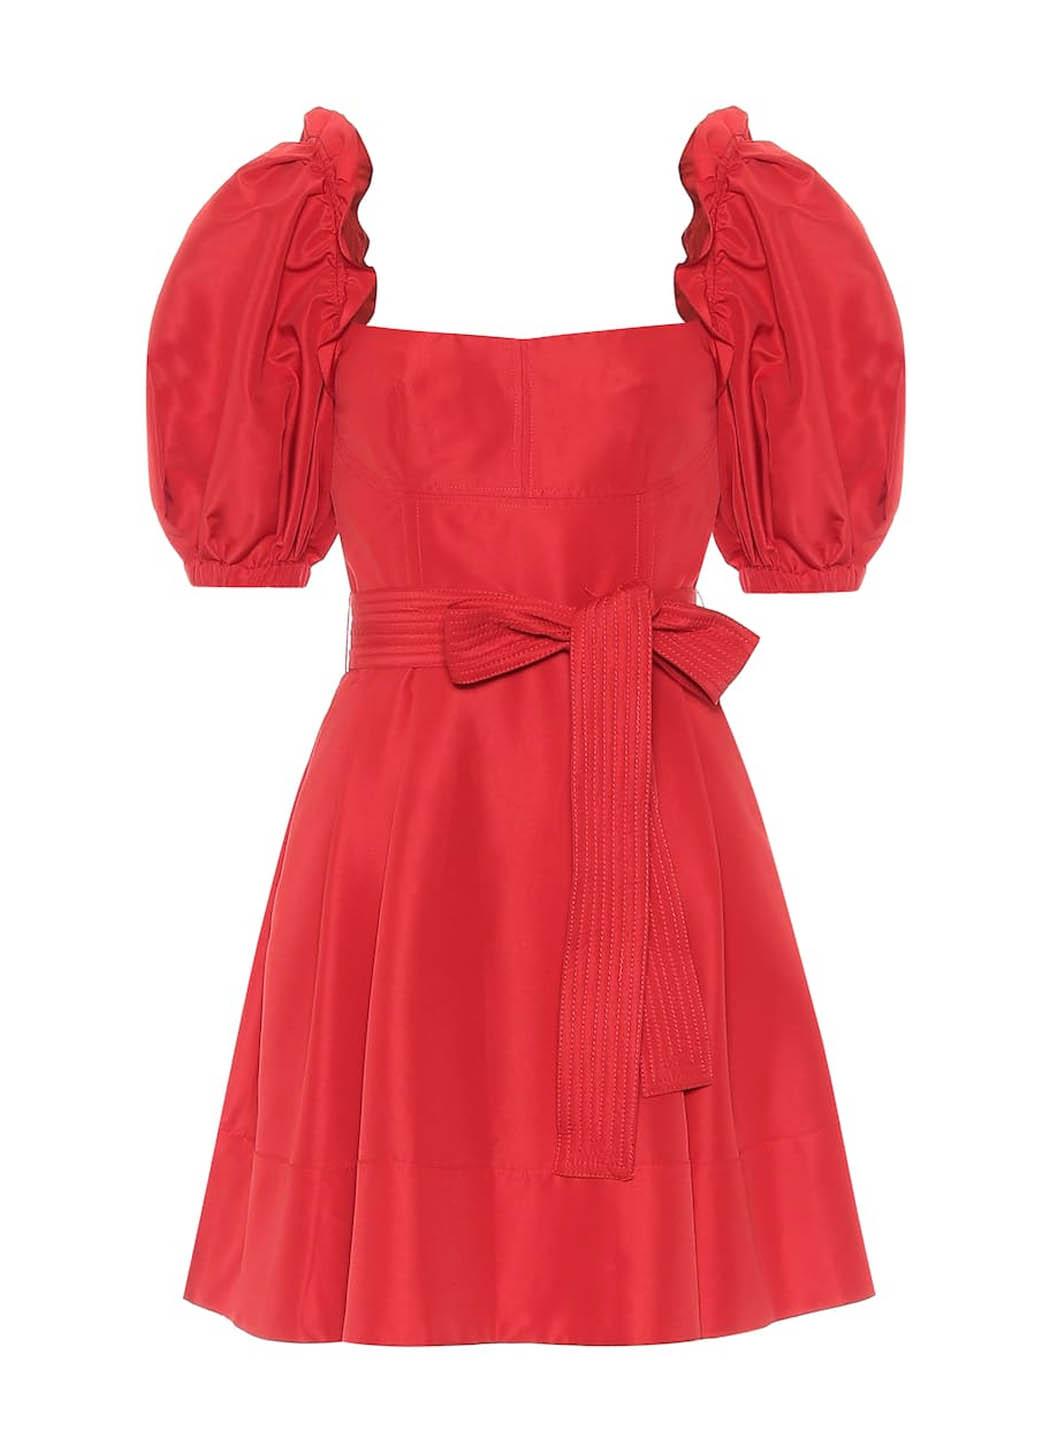 red self portraite dress